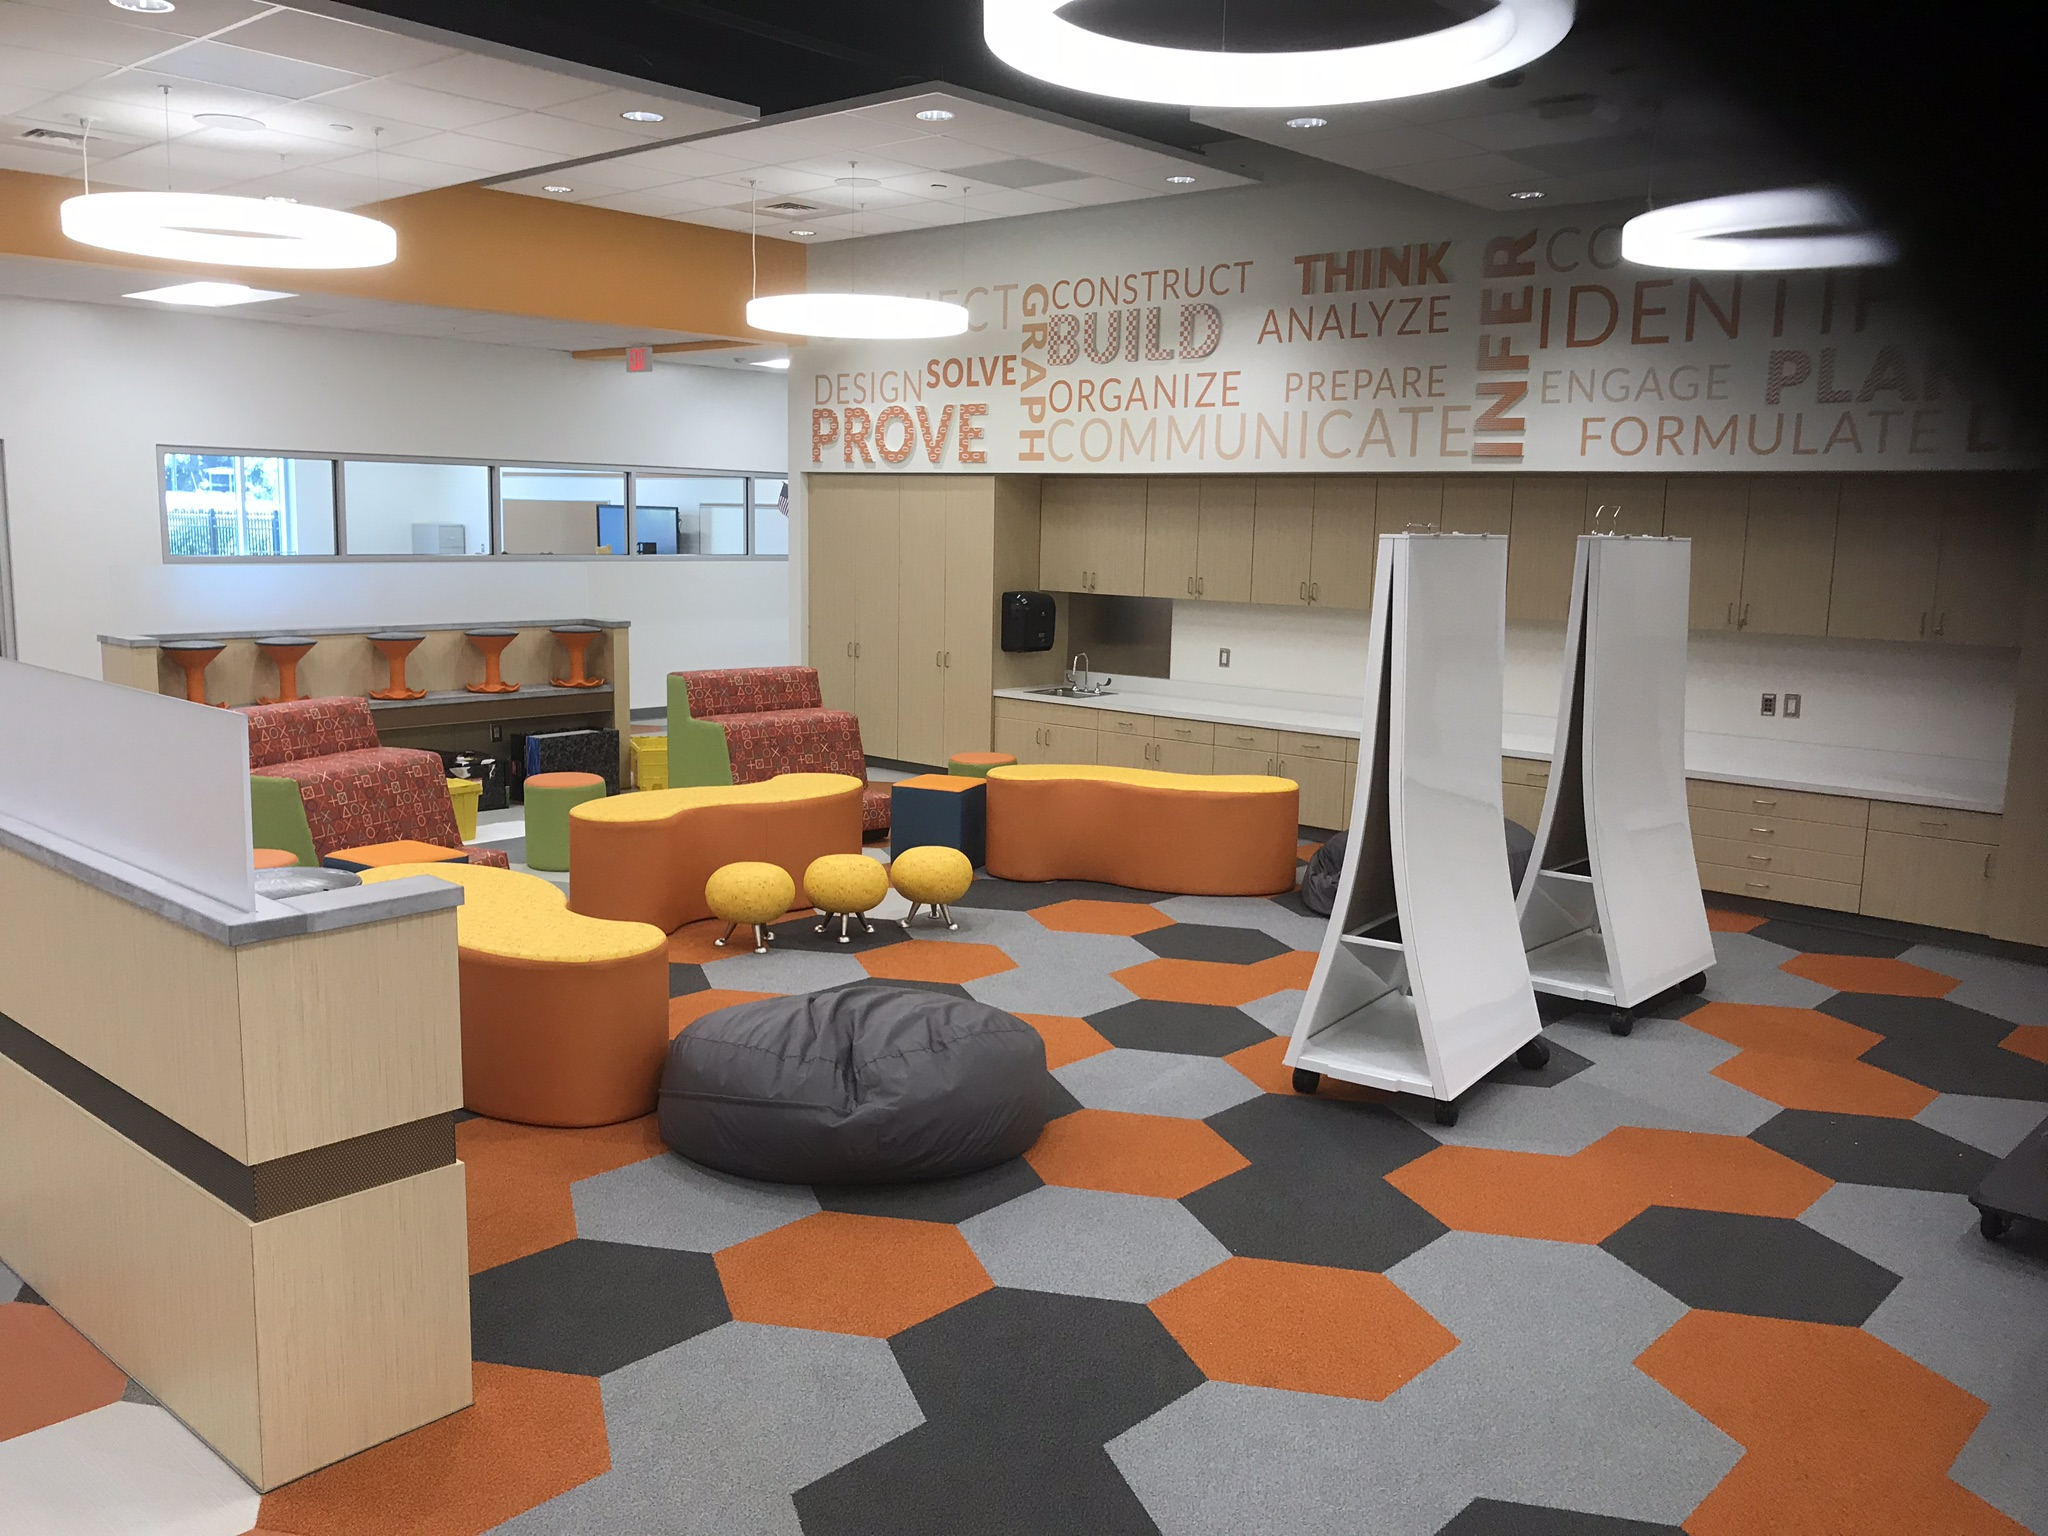 Creative floors for an inspiring new school